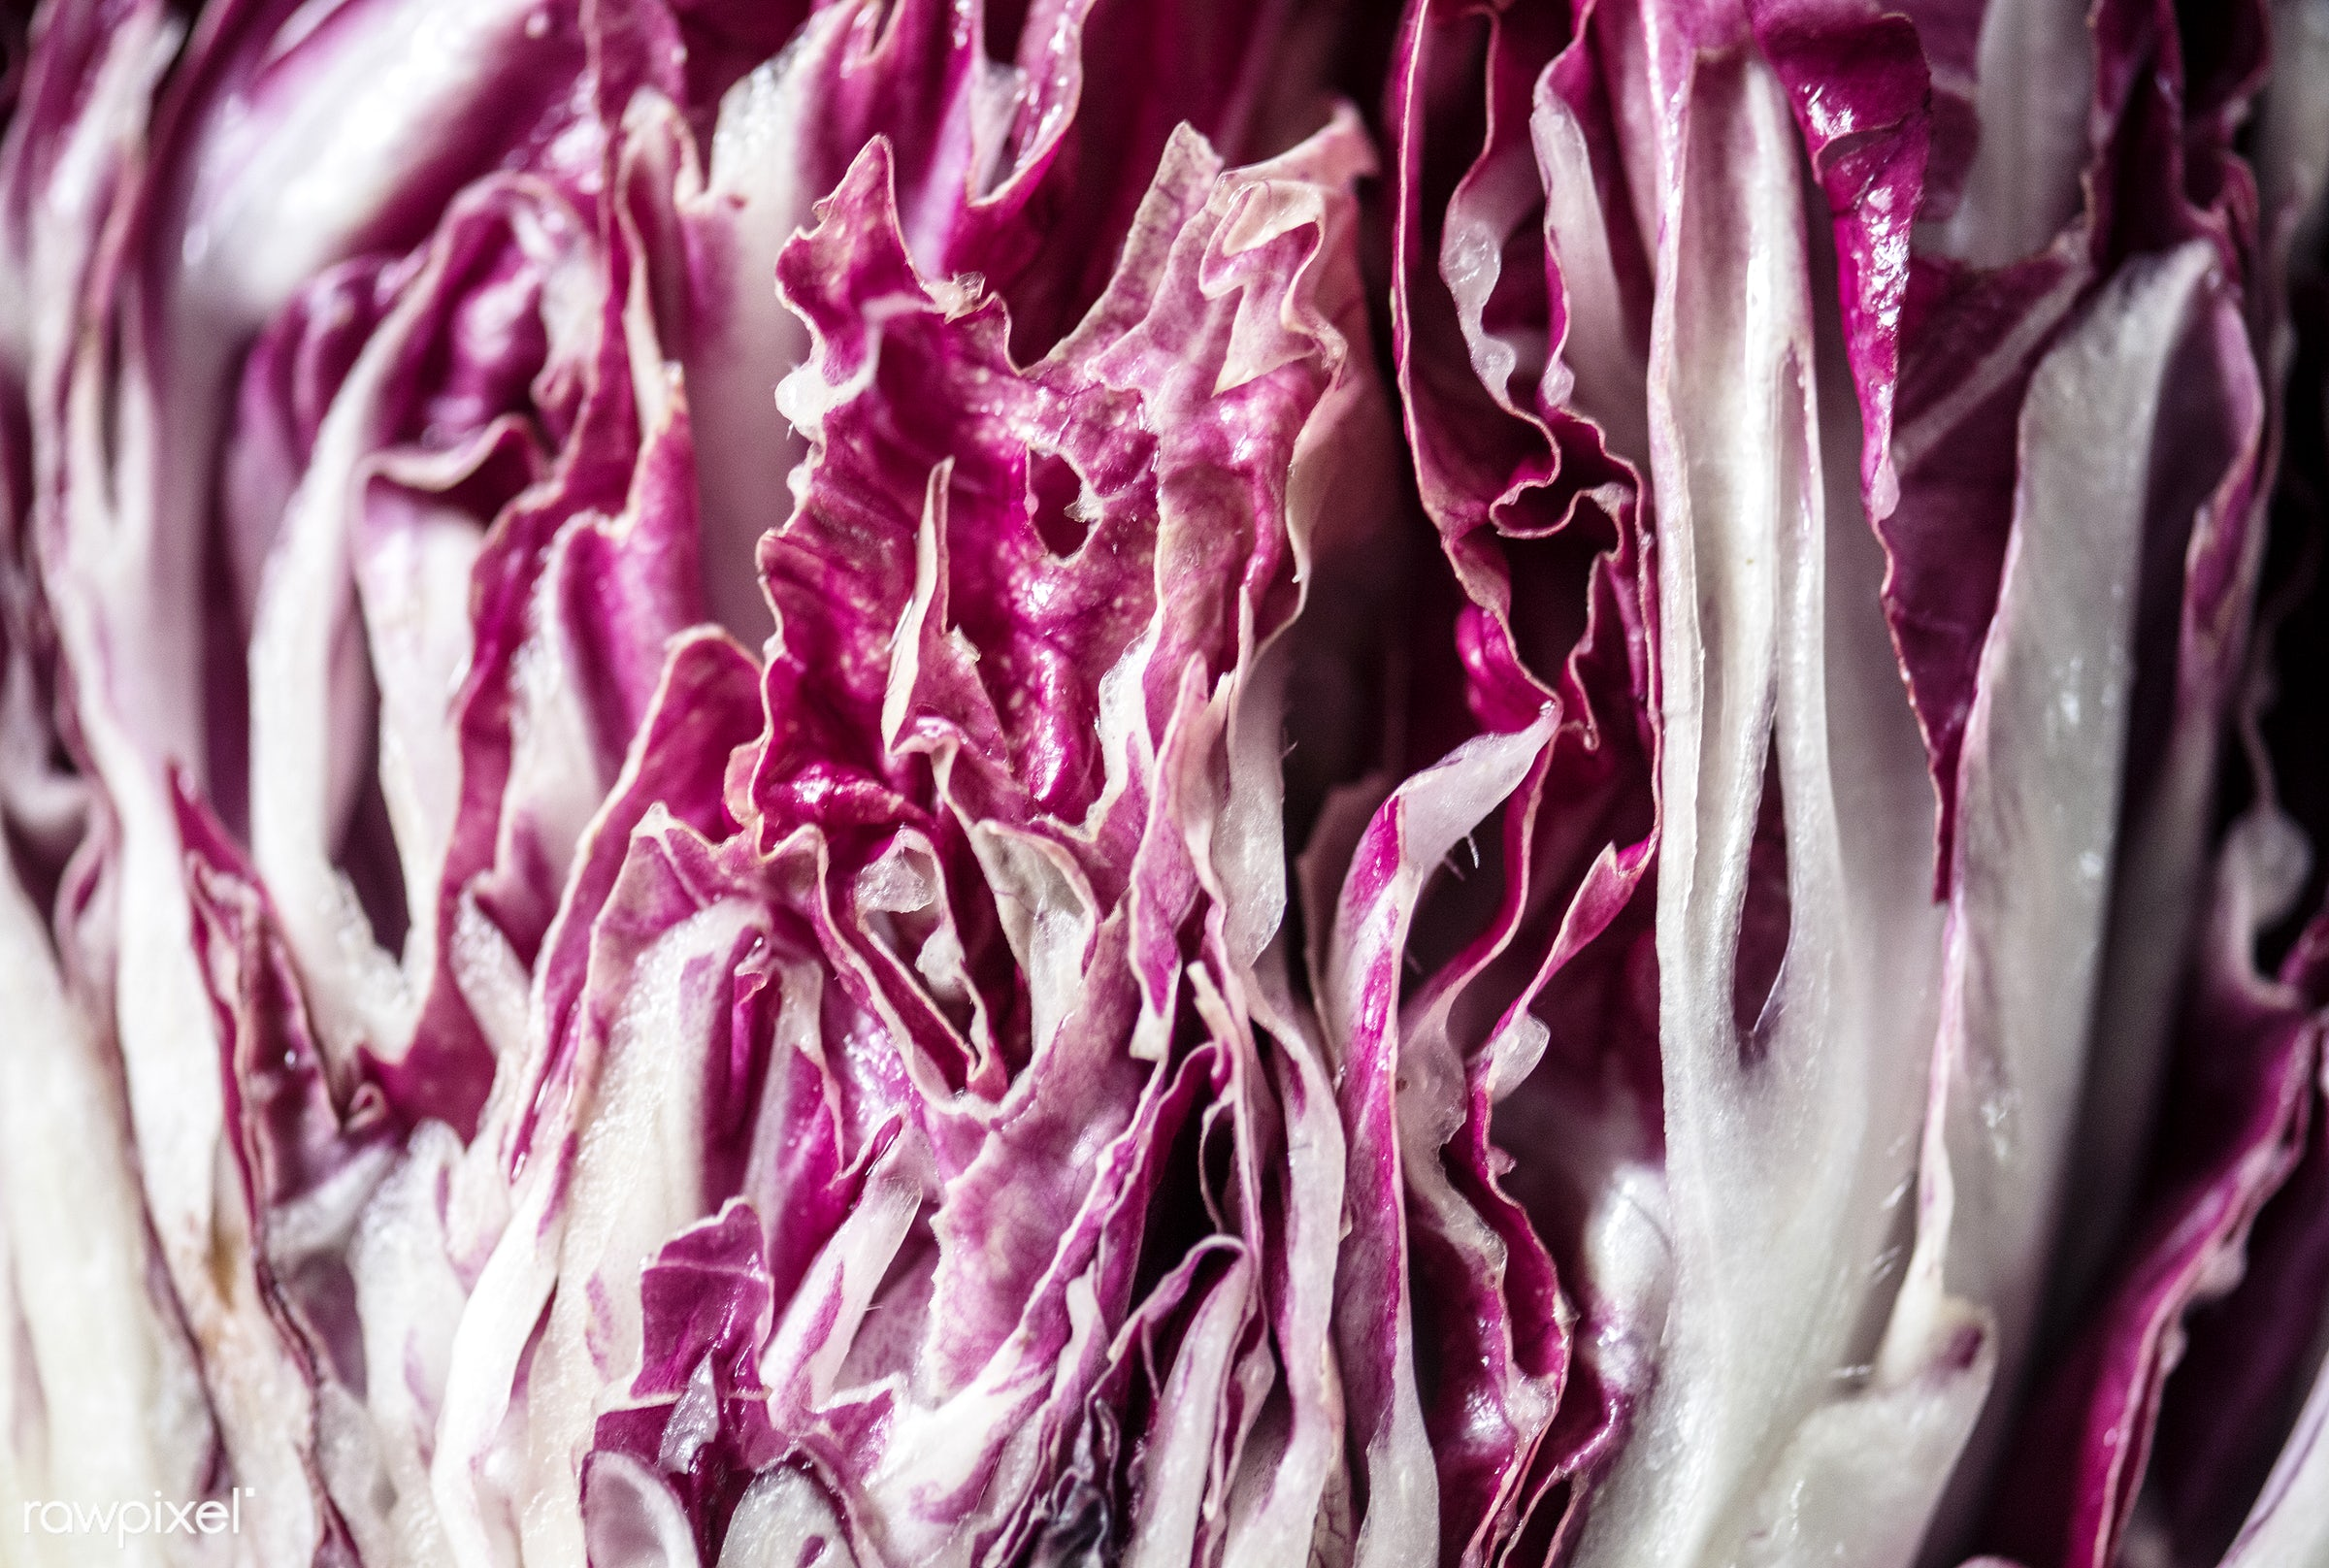 raw, culinary, veggies, fiber, edible, organic, nutrition, cabbage, fresh, food, healthy, ingredient, vegetable, natural